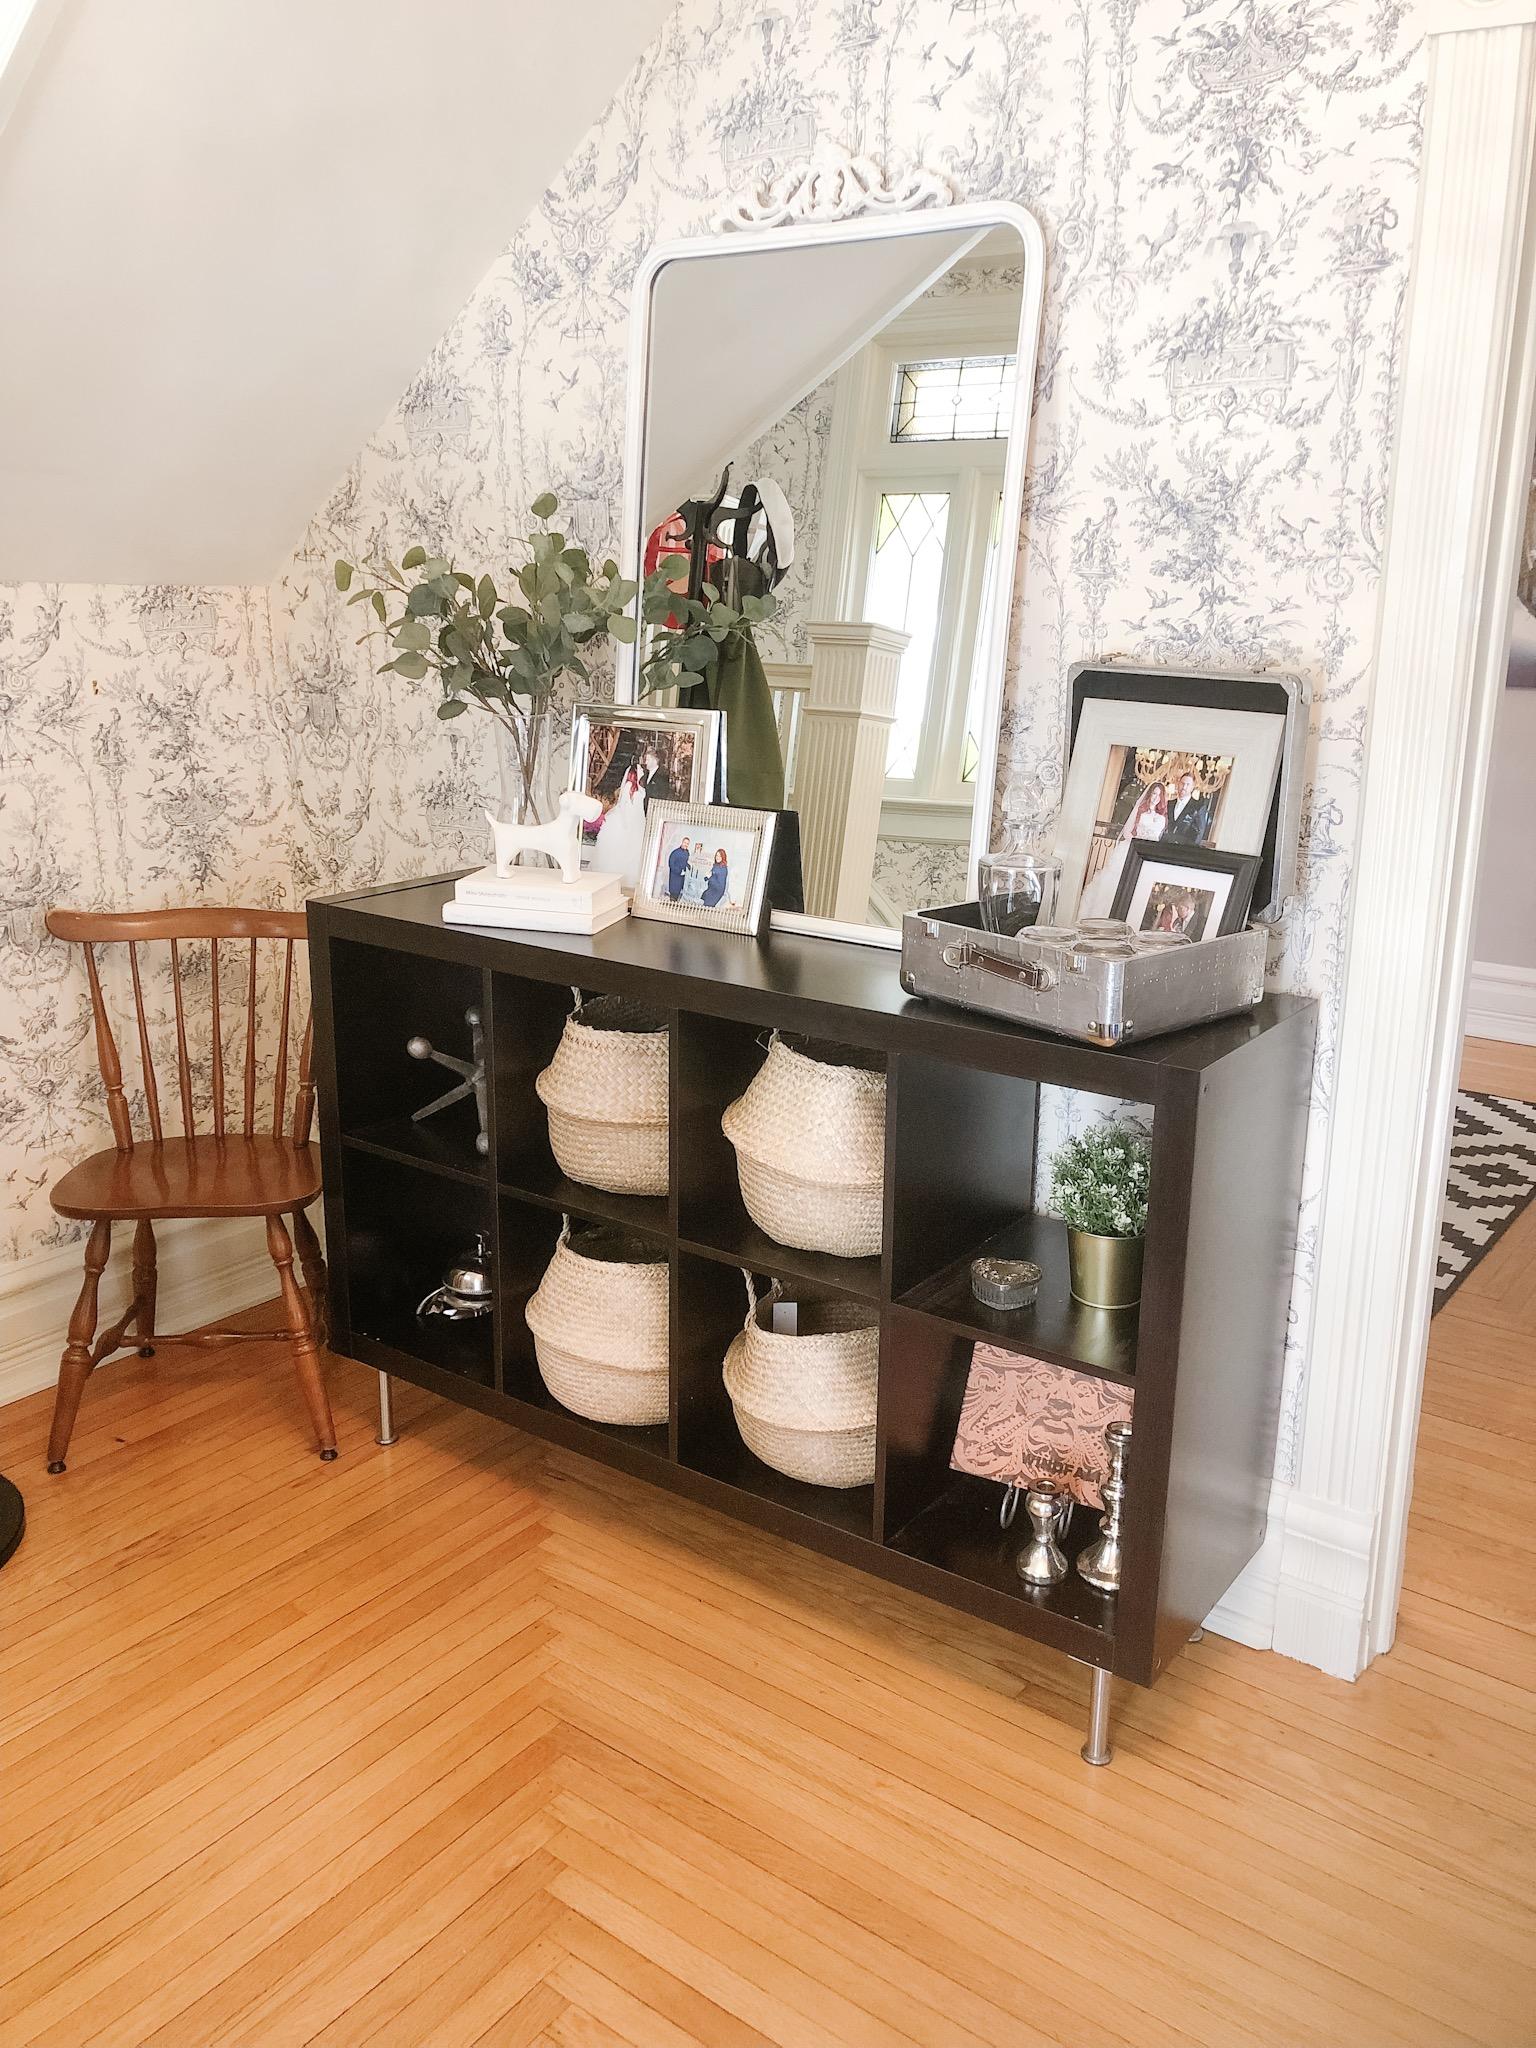 Foyer in interior decorator Heather Prestanski's chatham home